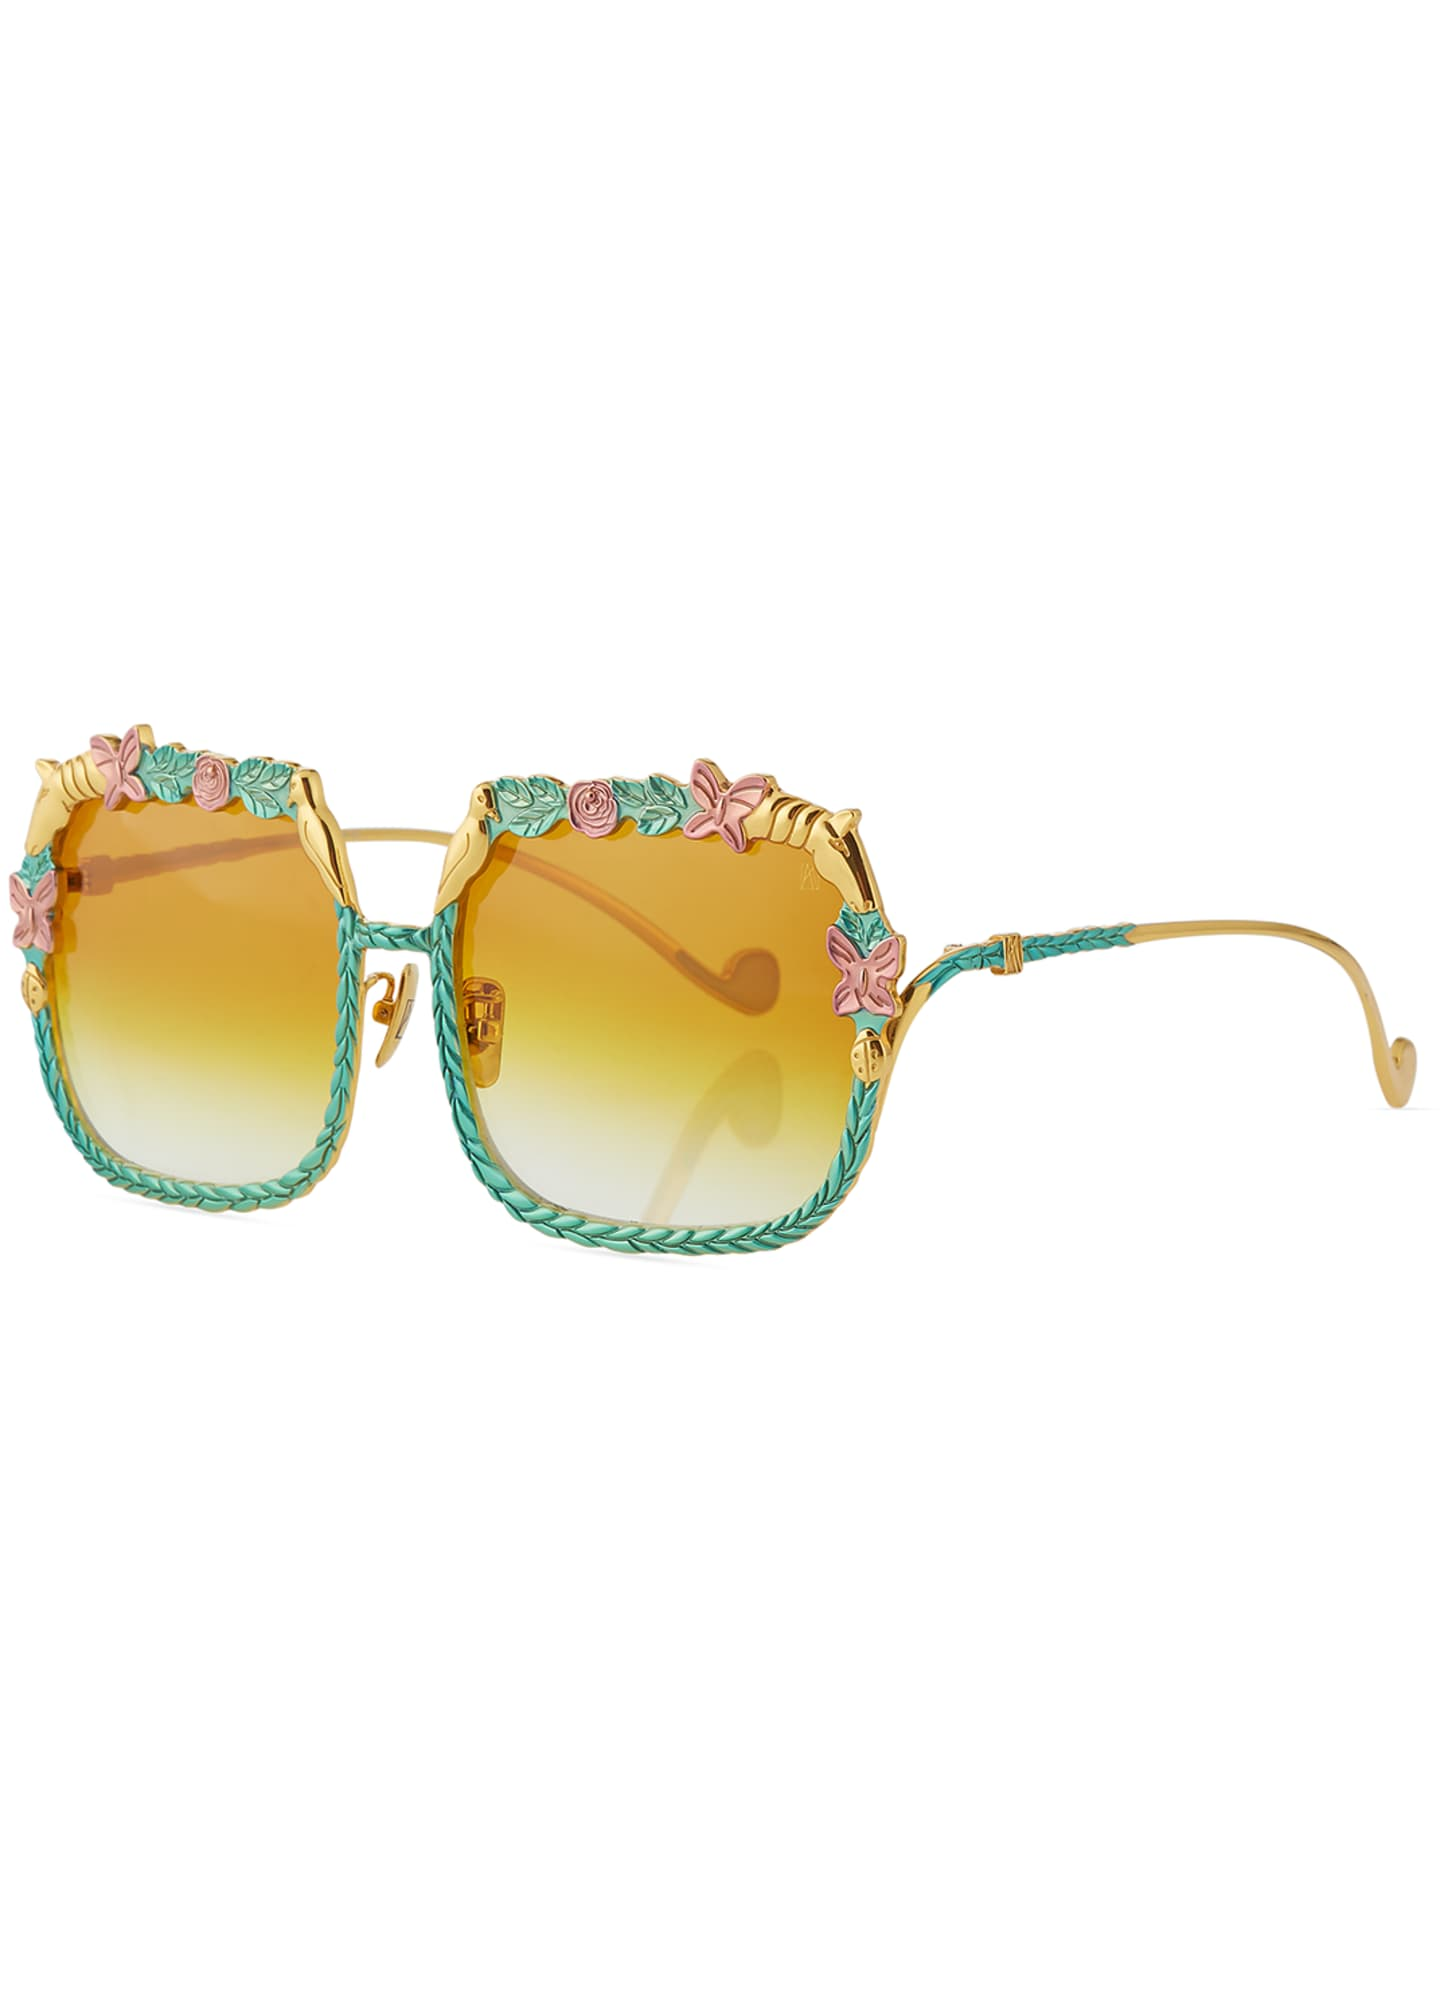 Anna-Karin Karlsson The Garden Square Gradient Sunglasses